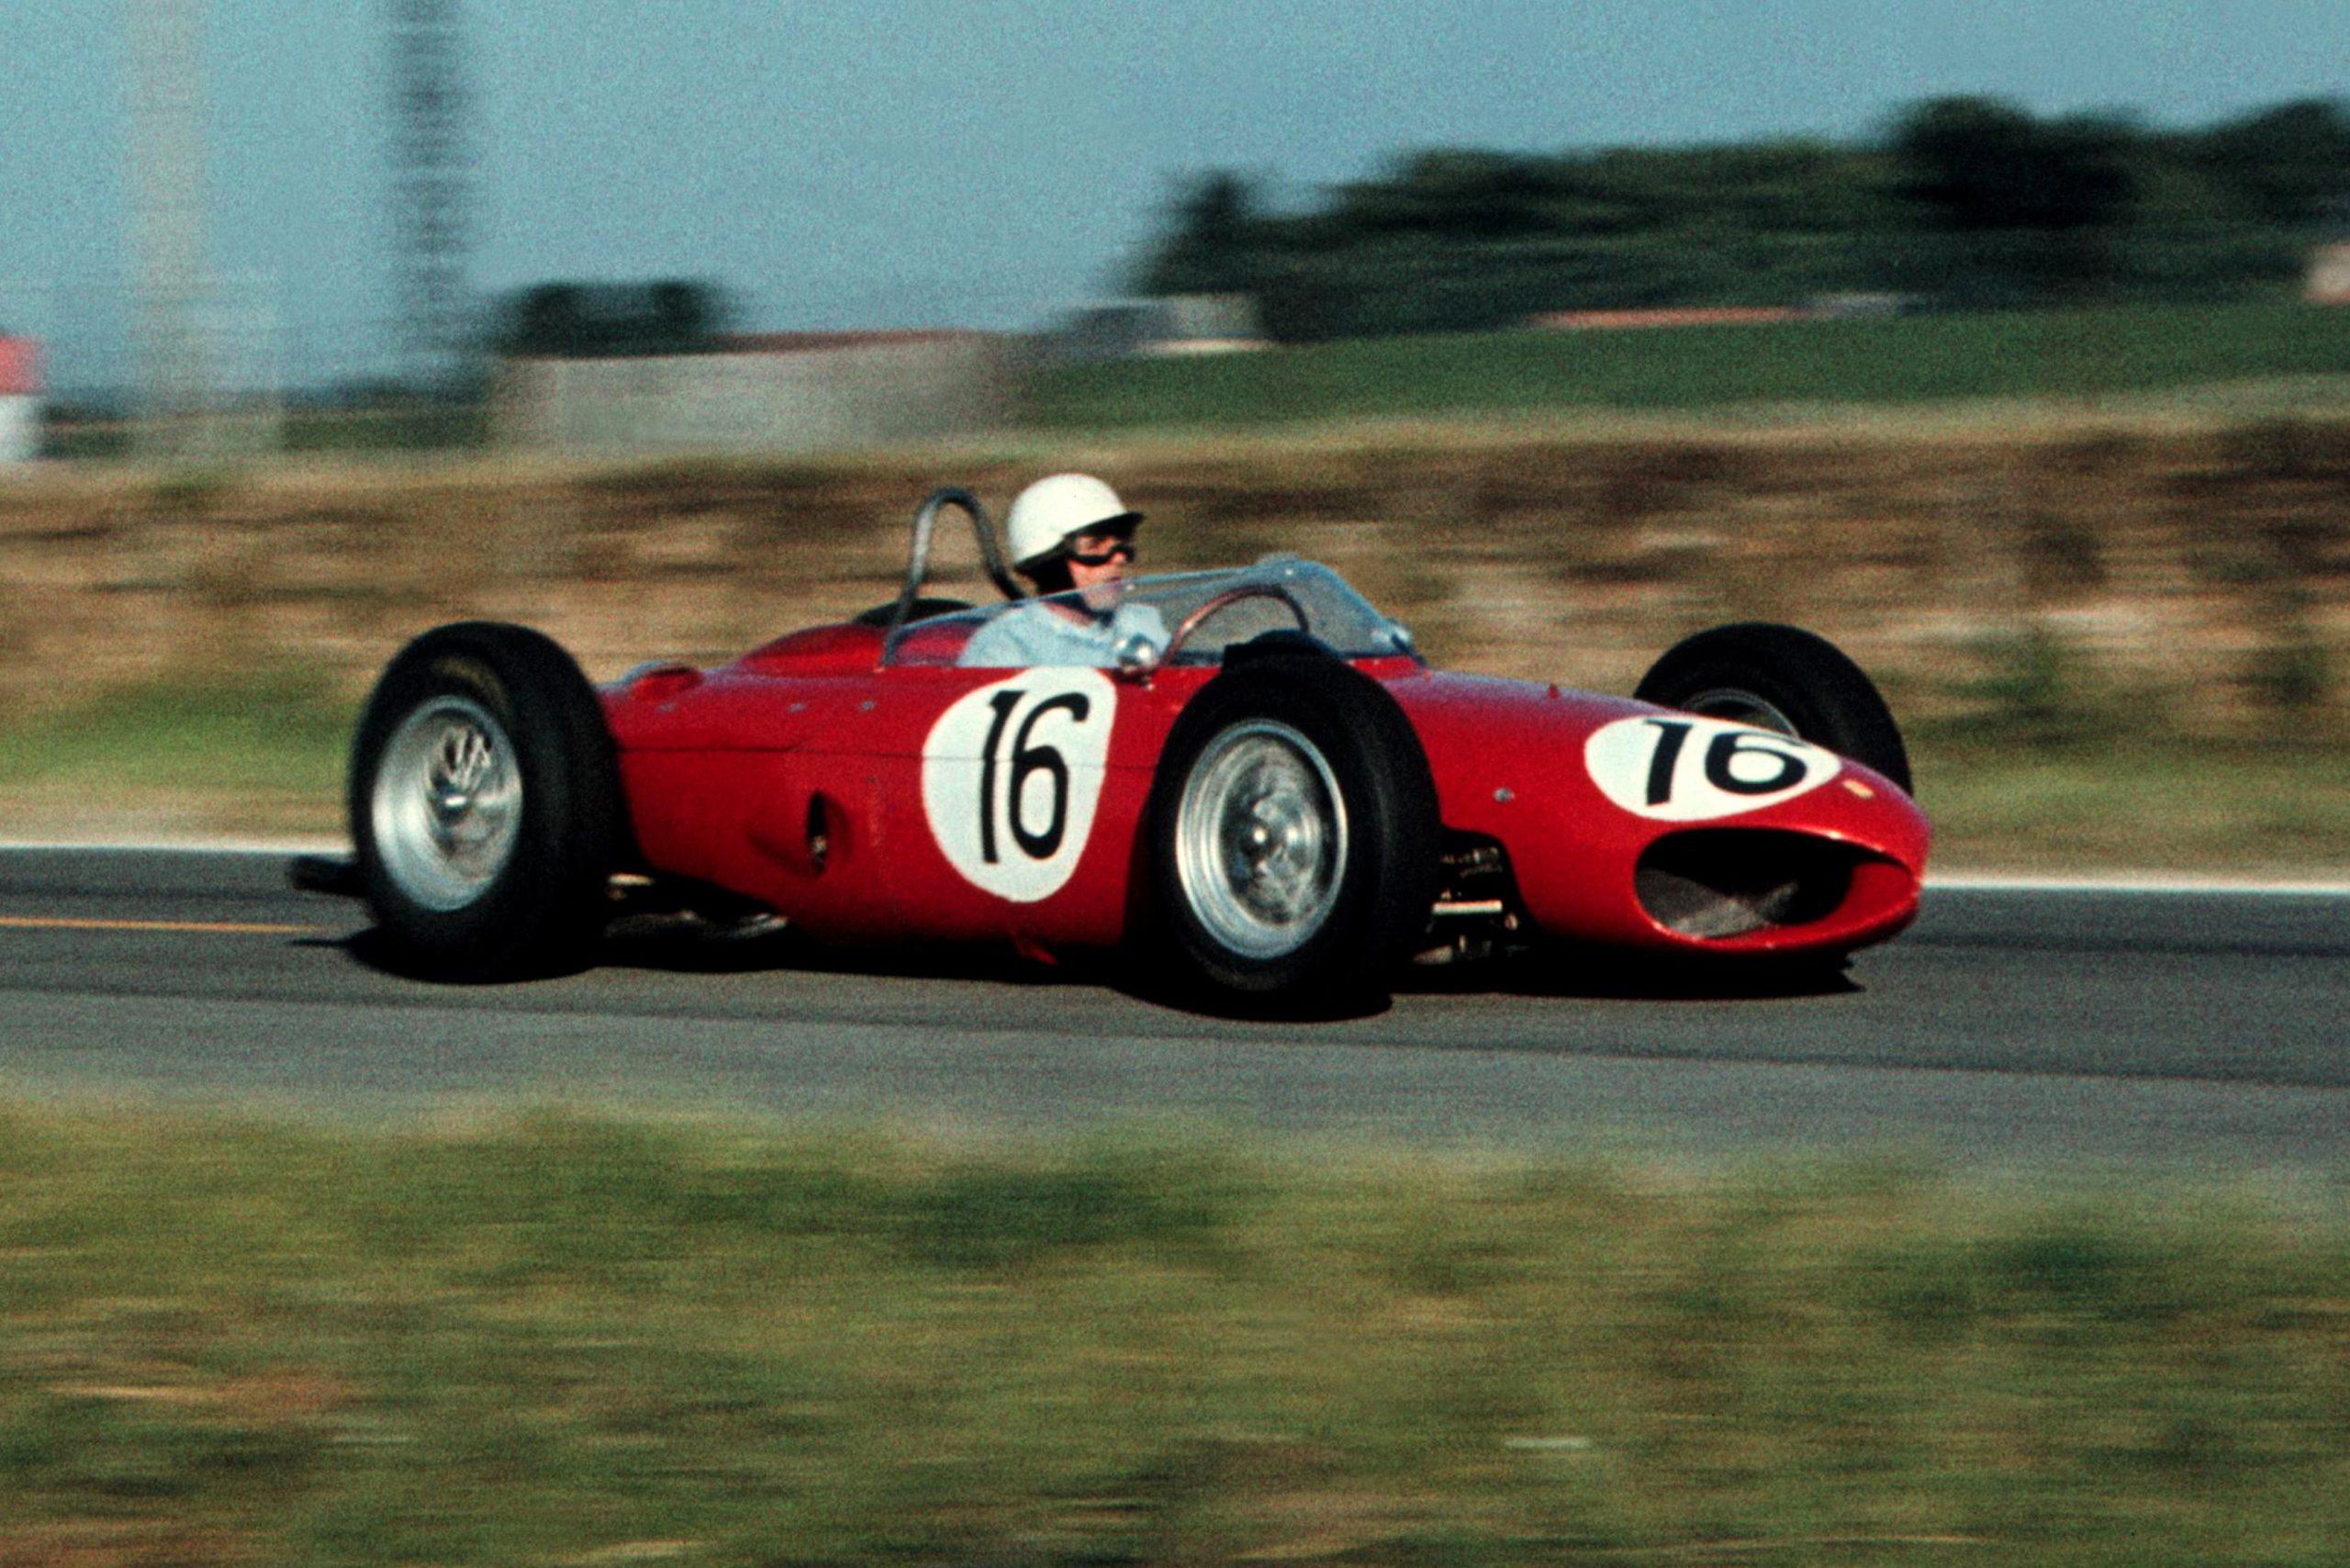 Phil Hill in his Ferrari 156.